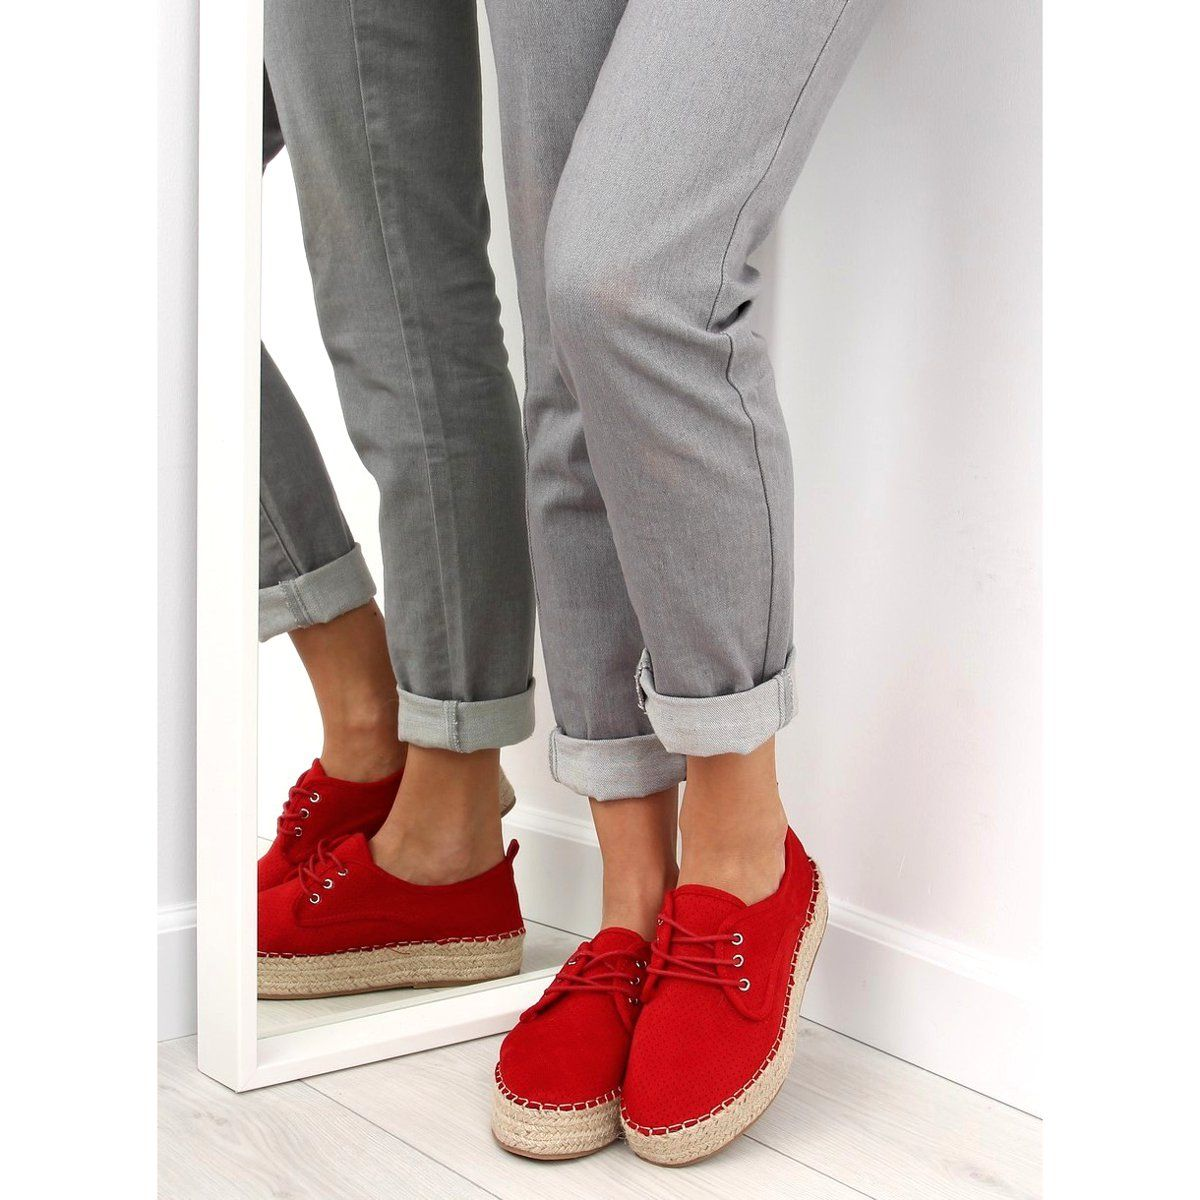 Trampki Na Koturnie Czerwone Nb168 Sneakers Shoes Fashion